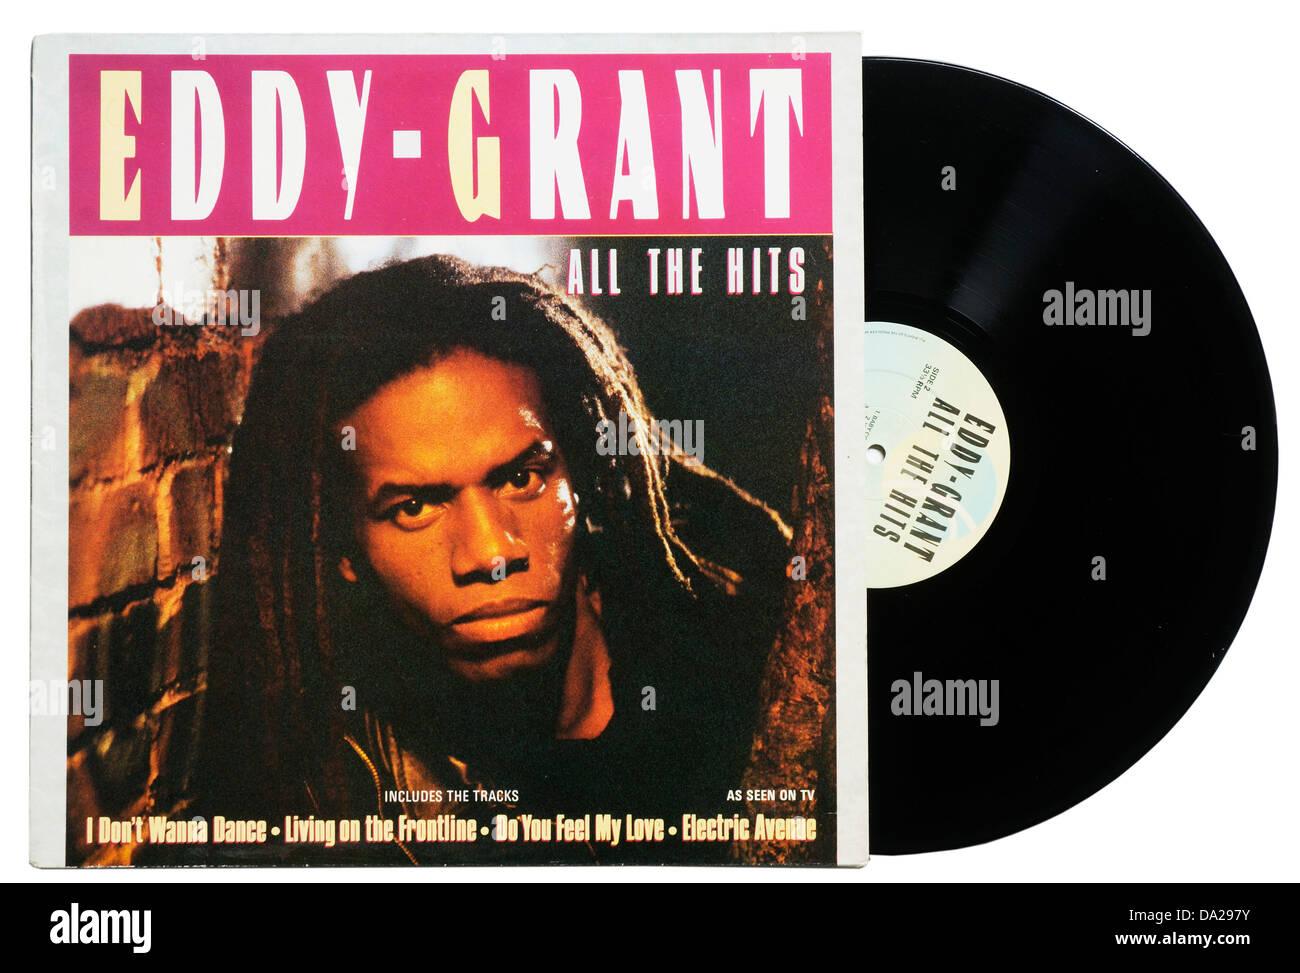 Eddy Grant All the Hits album - Stock Image